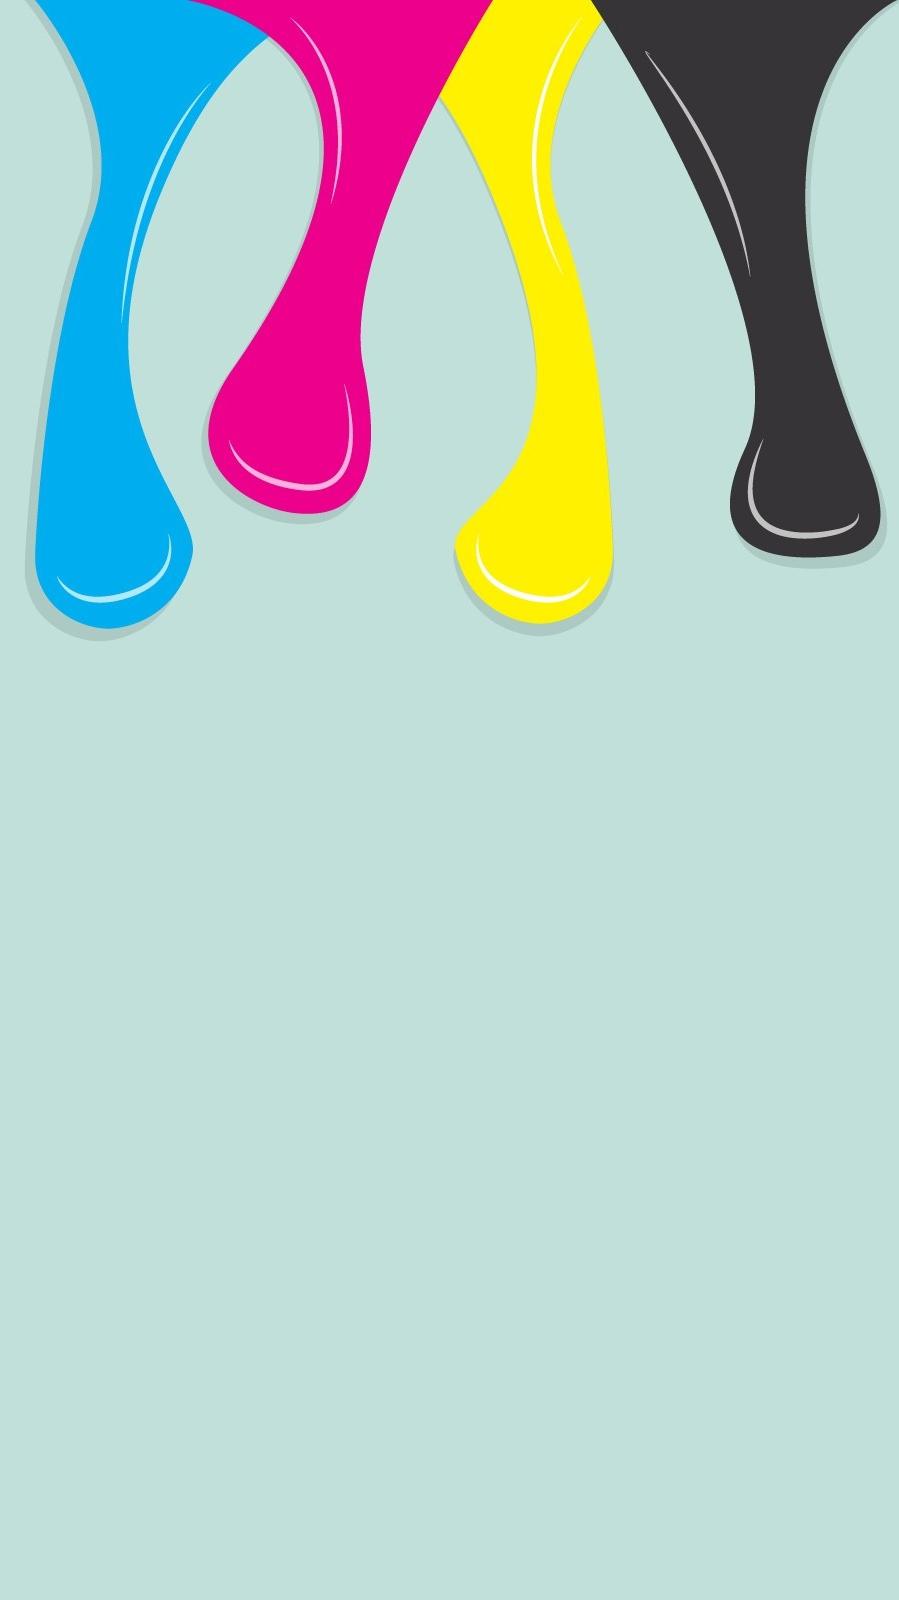 Minimal Water Colors iPhone Wallpaper iphoneswallpapers com